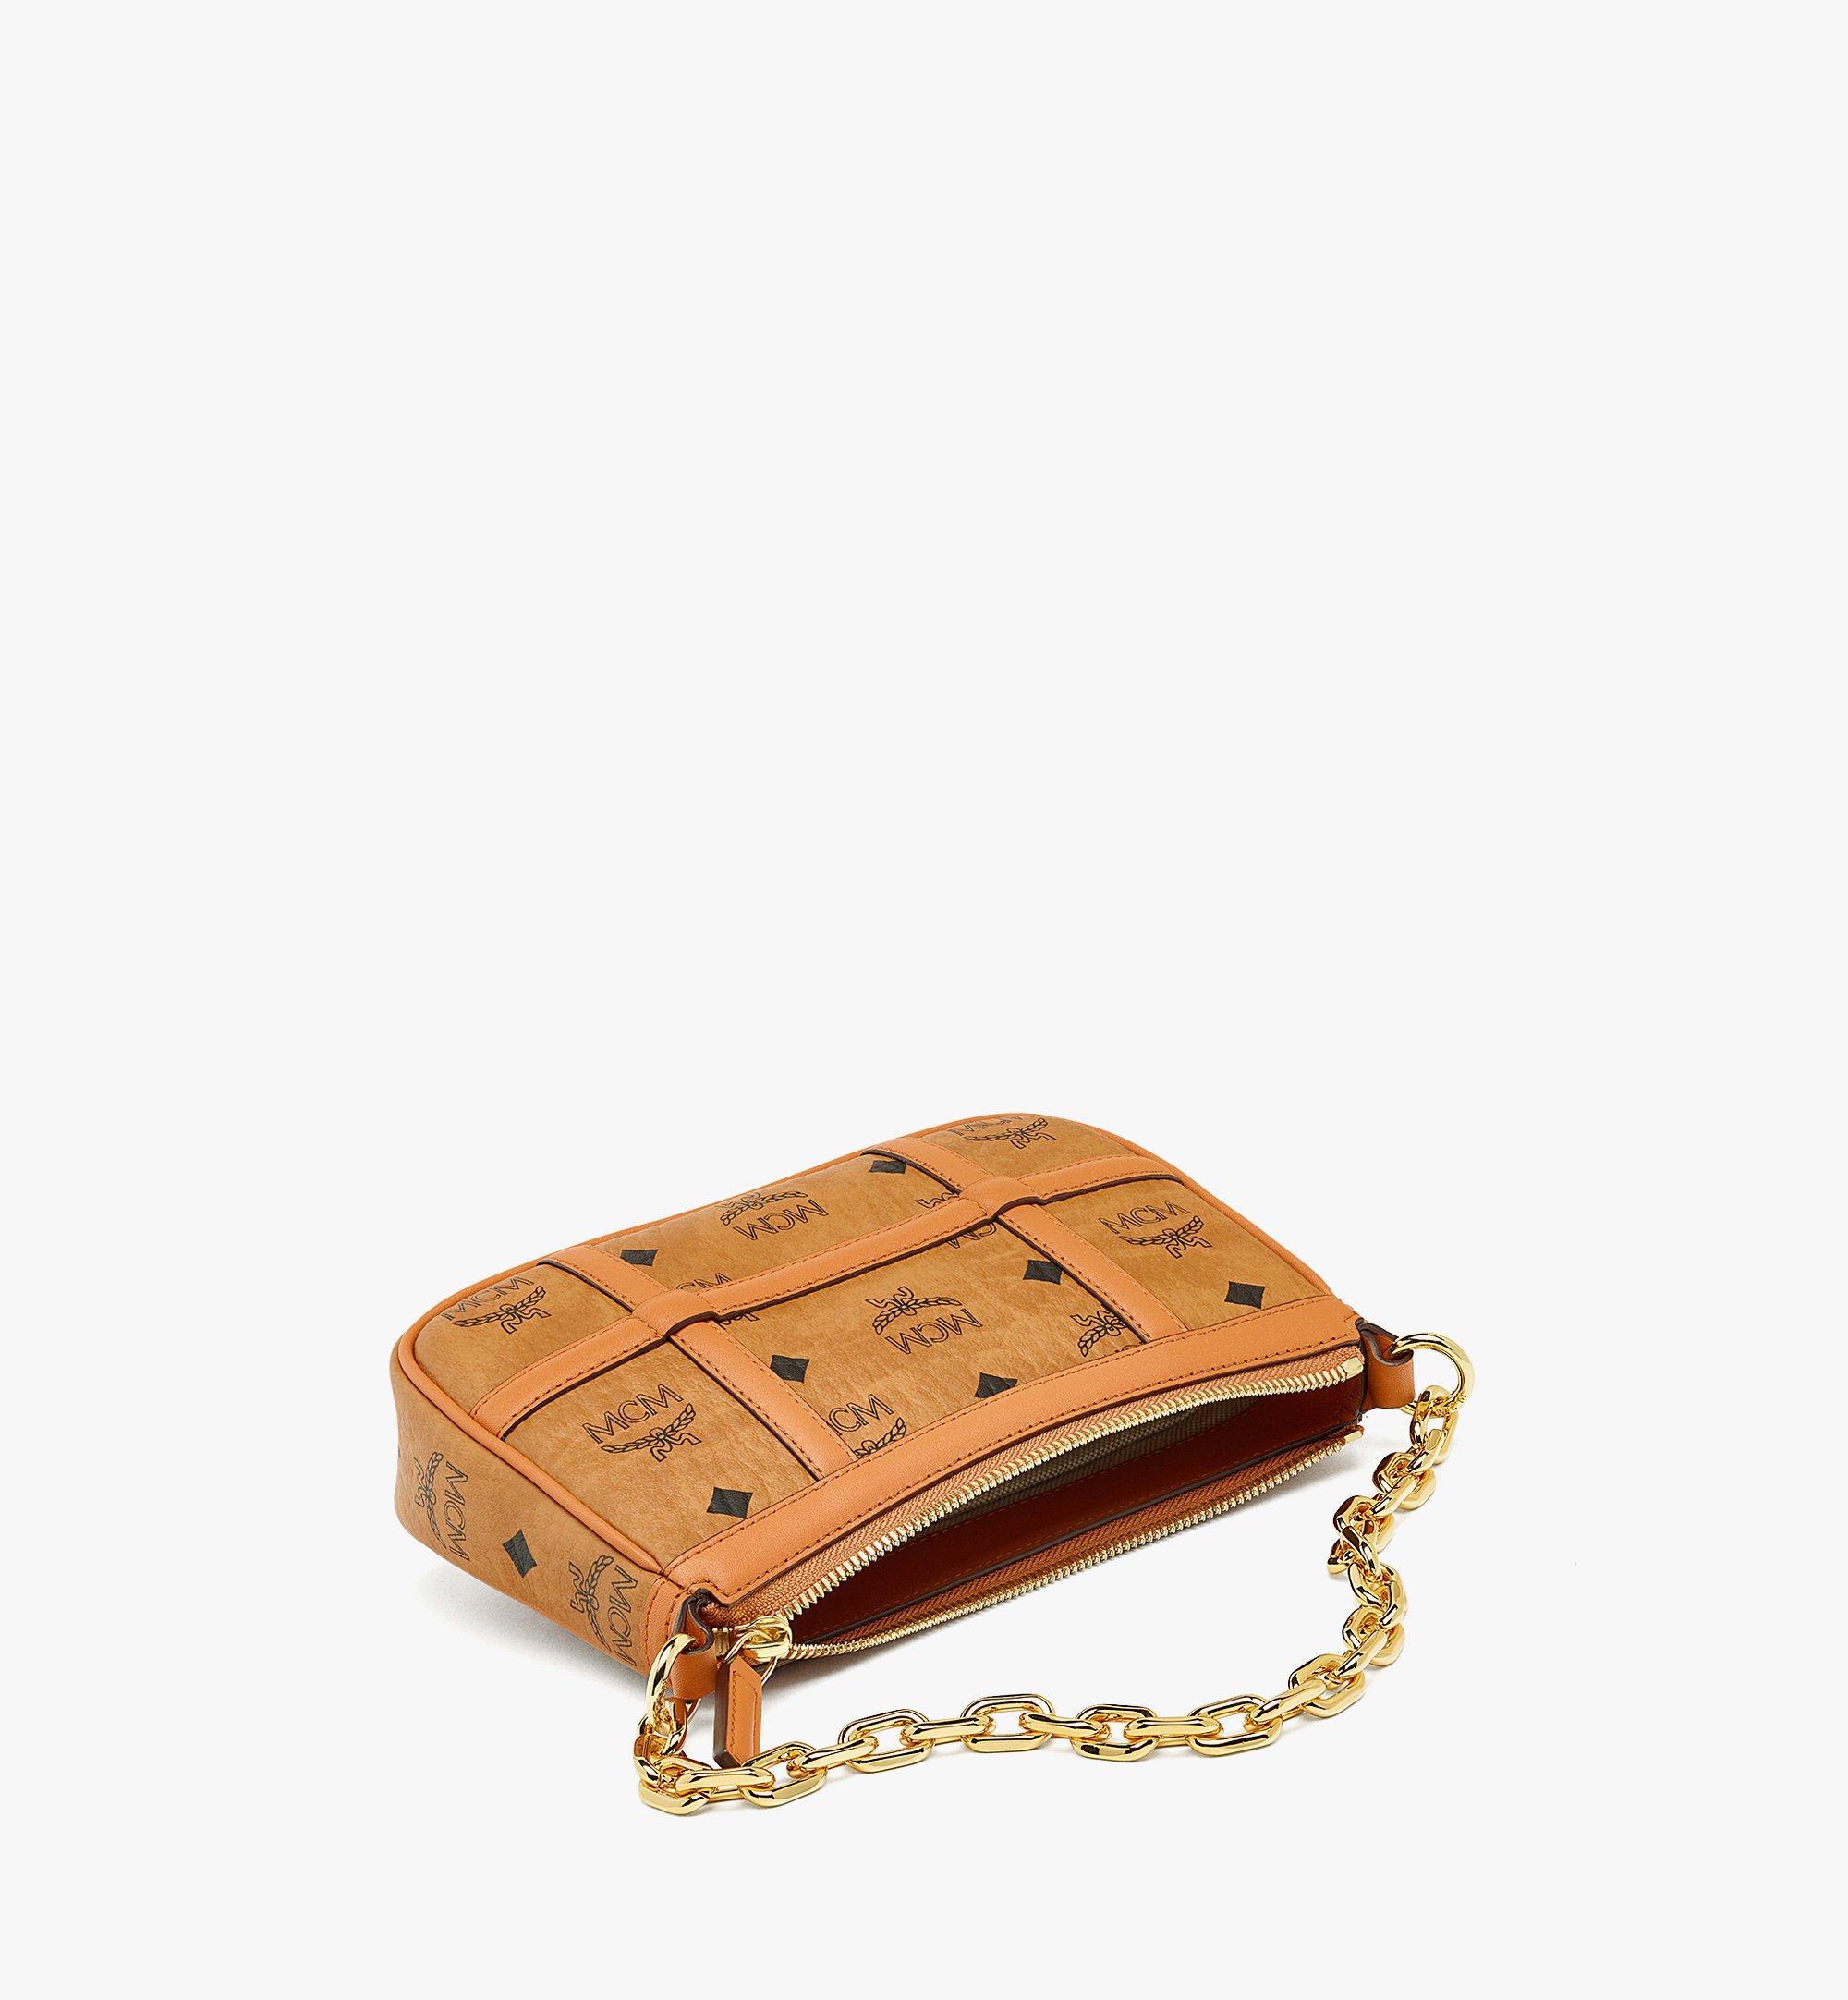 MCM Delmy Shoulder Bag in Visetos Cognac MWSBAER01CO001 Alternate View 2